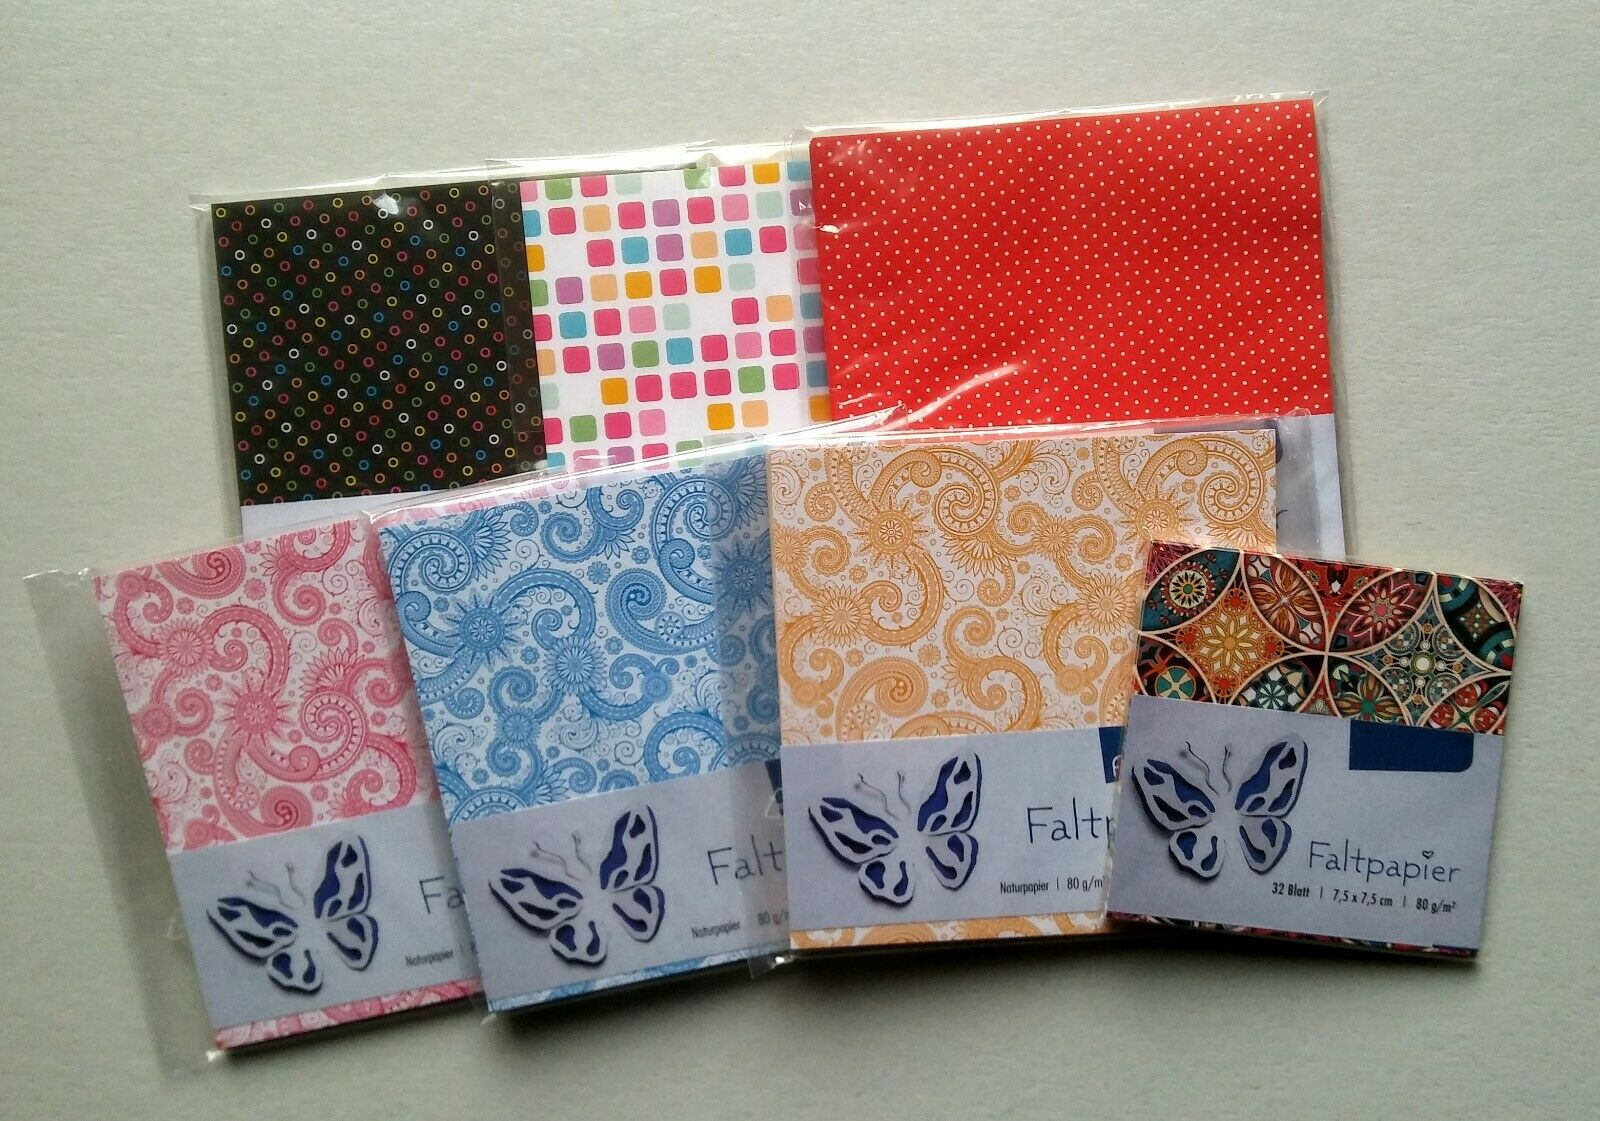 7 Sets Faltpapier Bascetta-Stern Origami Papier (2)